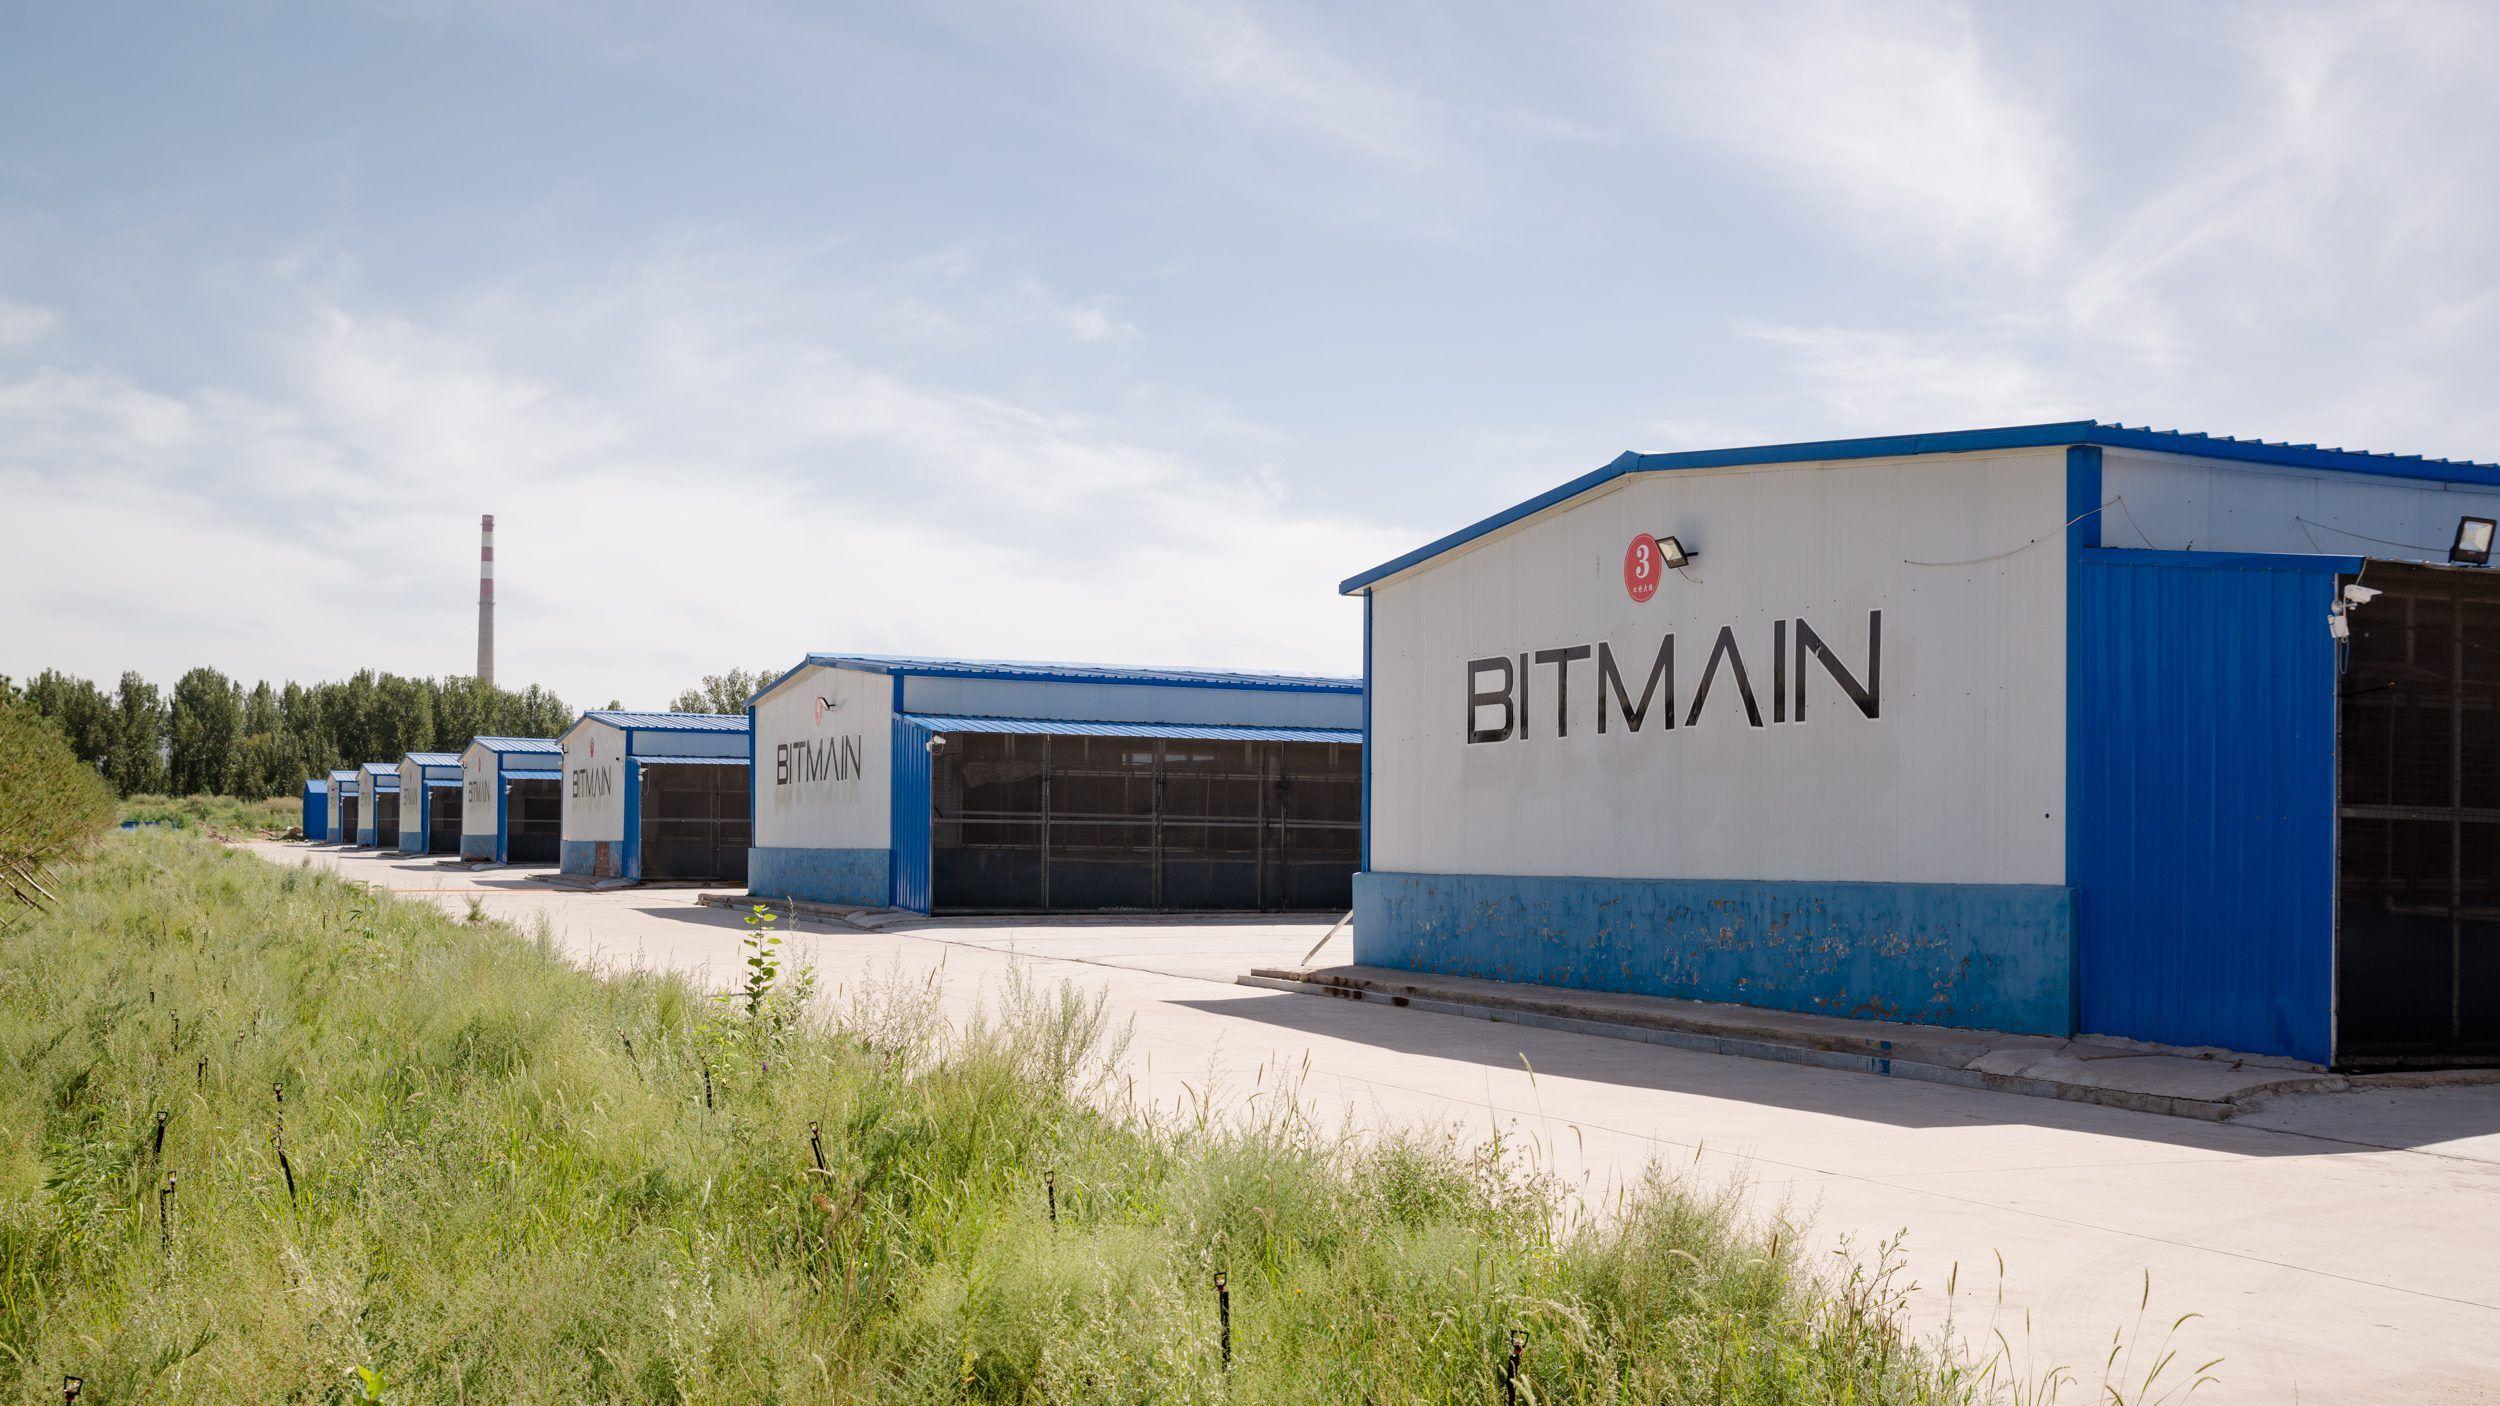 Bitmain's mining facility in Ordos, Inner Mongolia